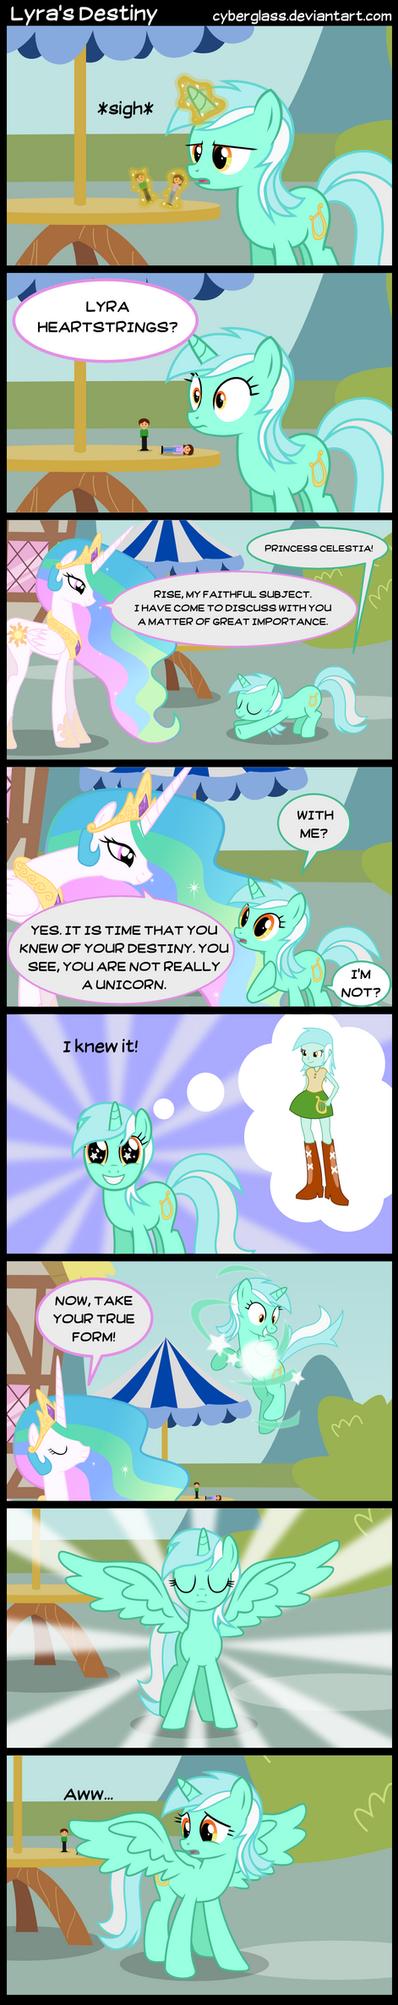 Lyra's Destiny by Cyberglass